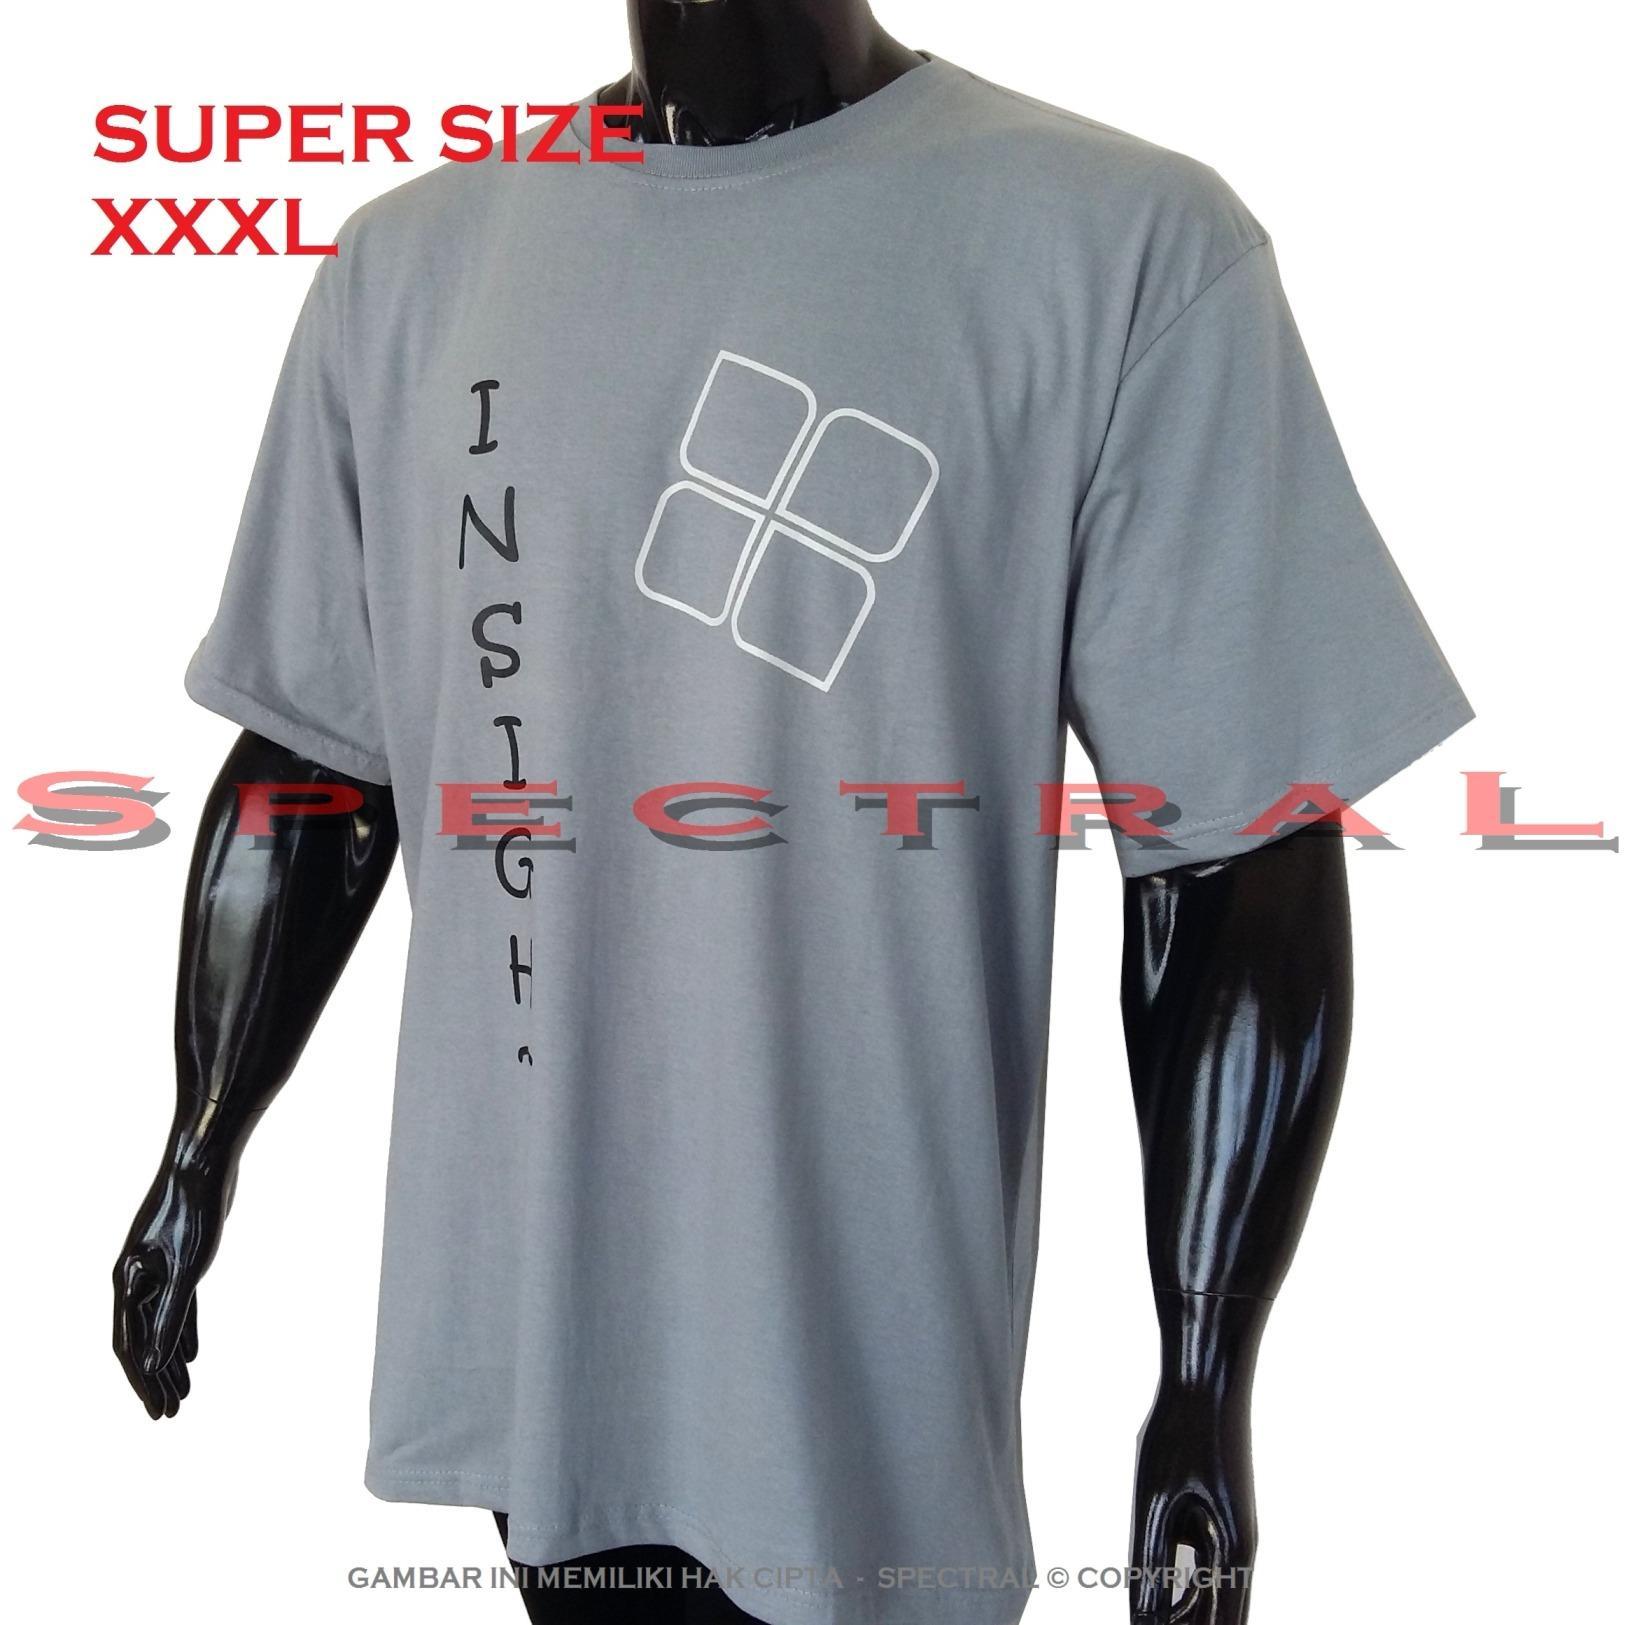 Spectral – 3XL SUPER BIG SIZE XXXL 100% Cotton Combed Kaos Distro Jumbo BIGSIZE T-Shirt Fashion Ukuran Besar Polos Celana Atasan Pria Wanita Katun Bapak Orang Tua Gemuk Gendut Simple Sport Casual Halus Baju Cowo Cewe Pakaian Super Size 3L INSIGHT 4 ABMUDA